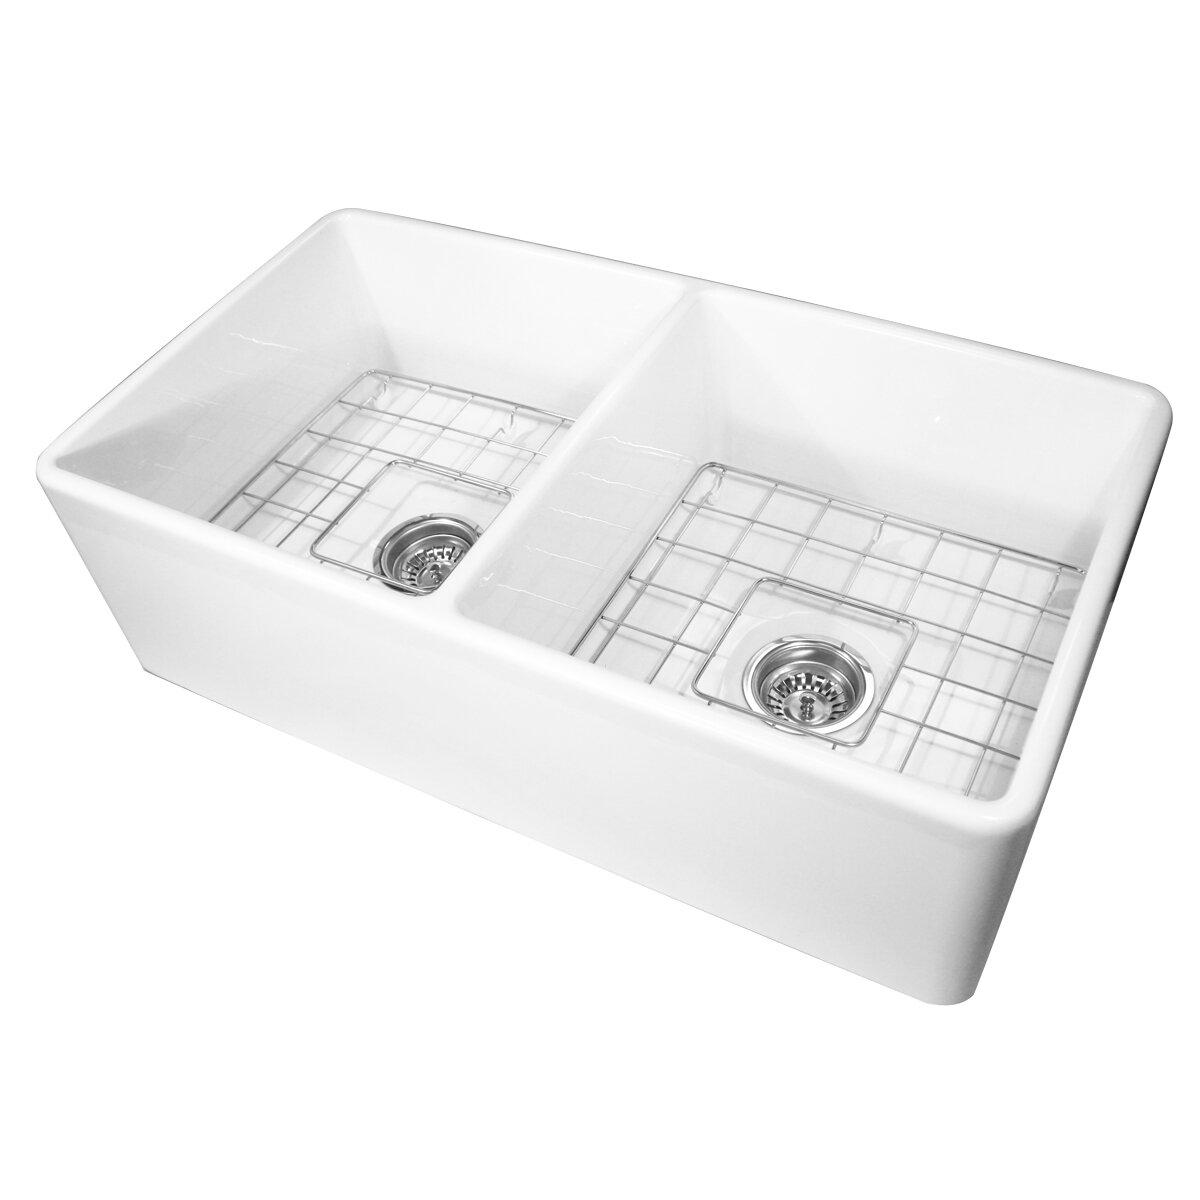 cape 33 x 18 double bowl kitchen sink with grids. Interior Design Ideas. Home Design Ideas